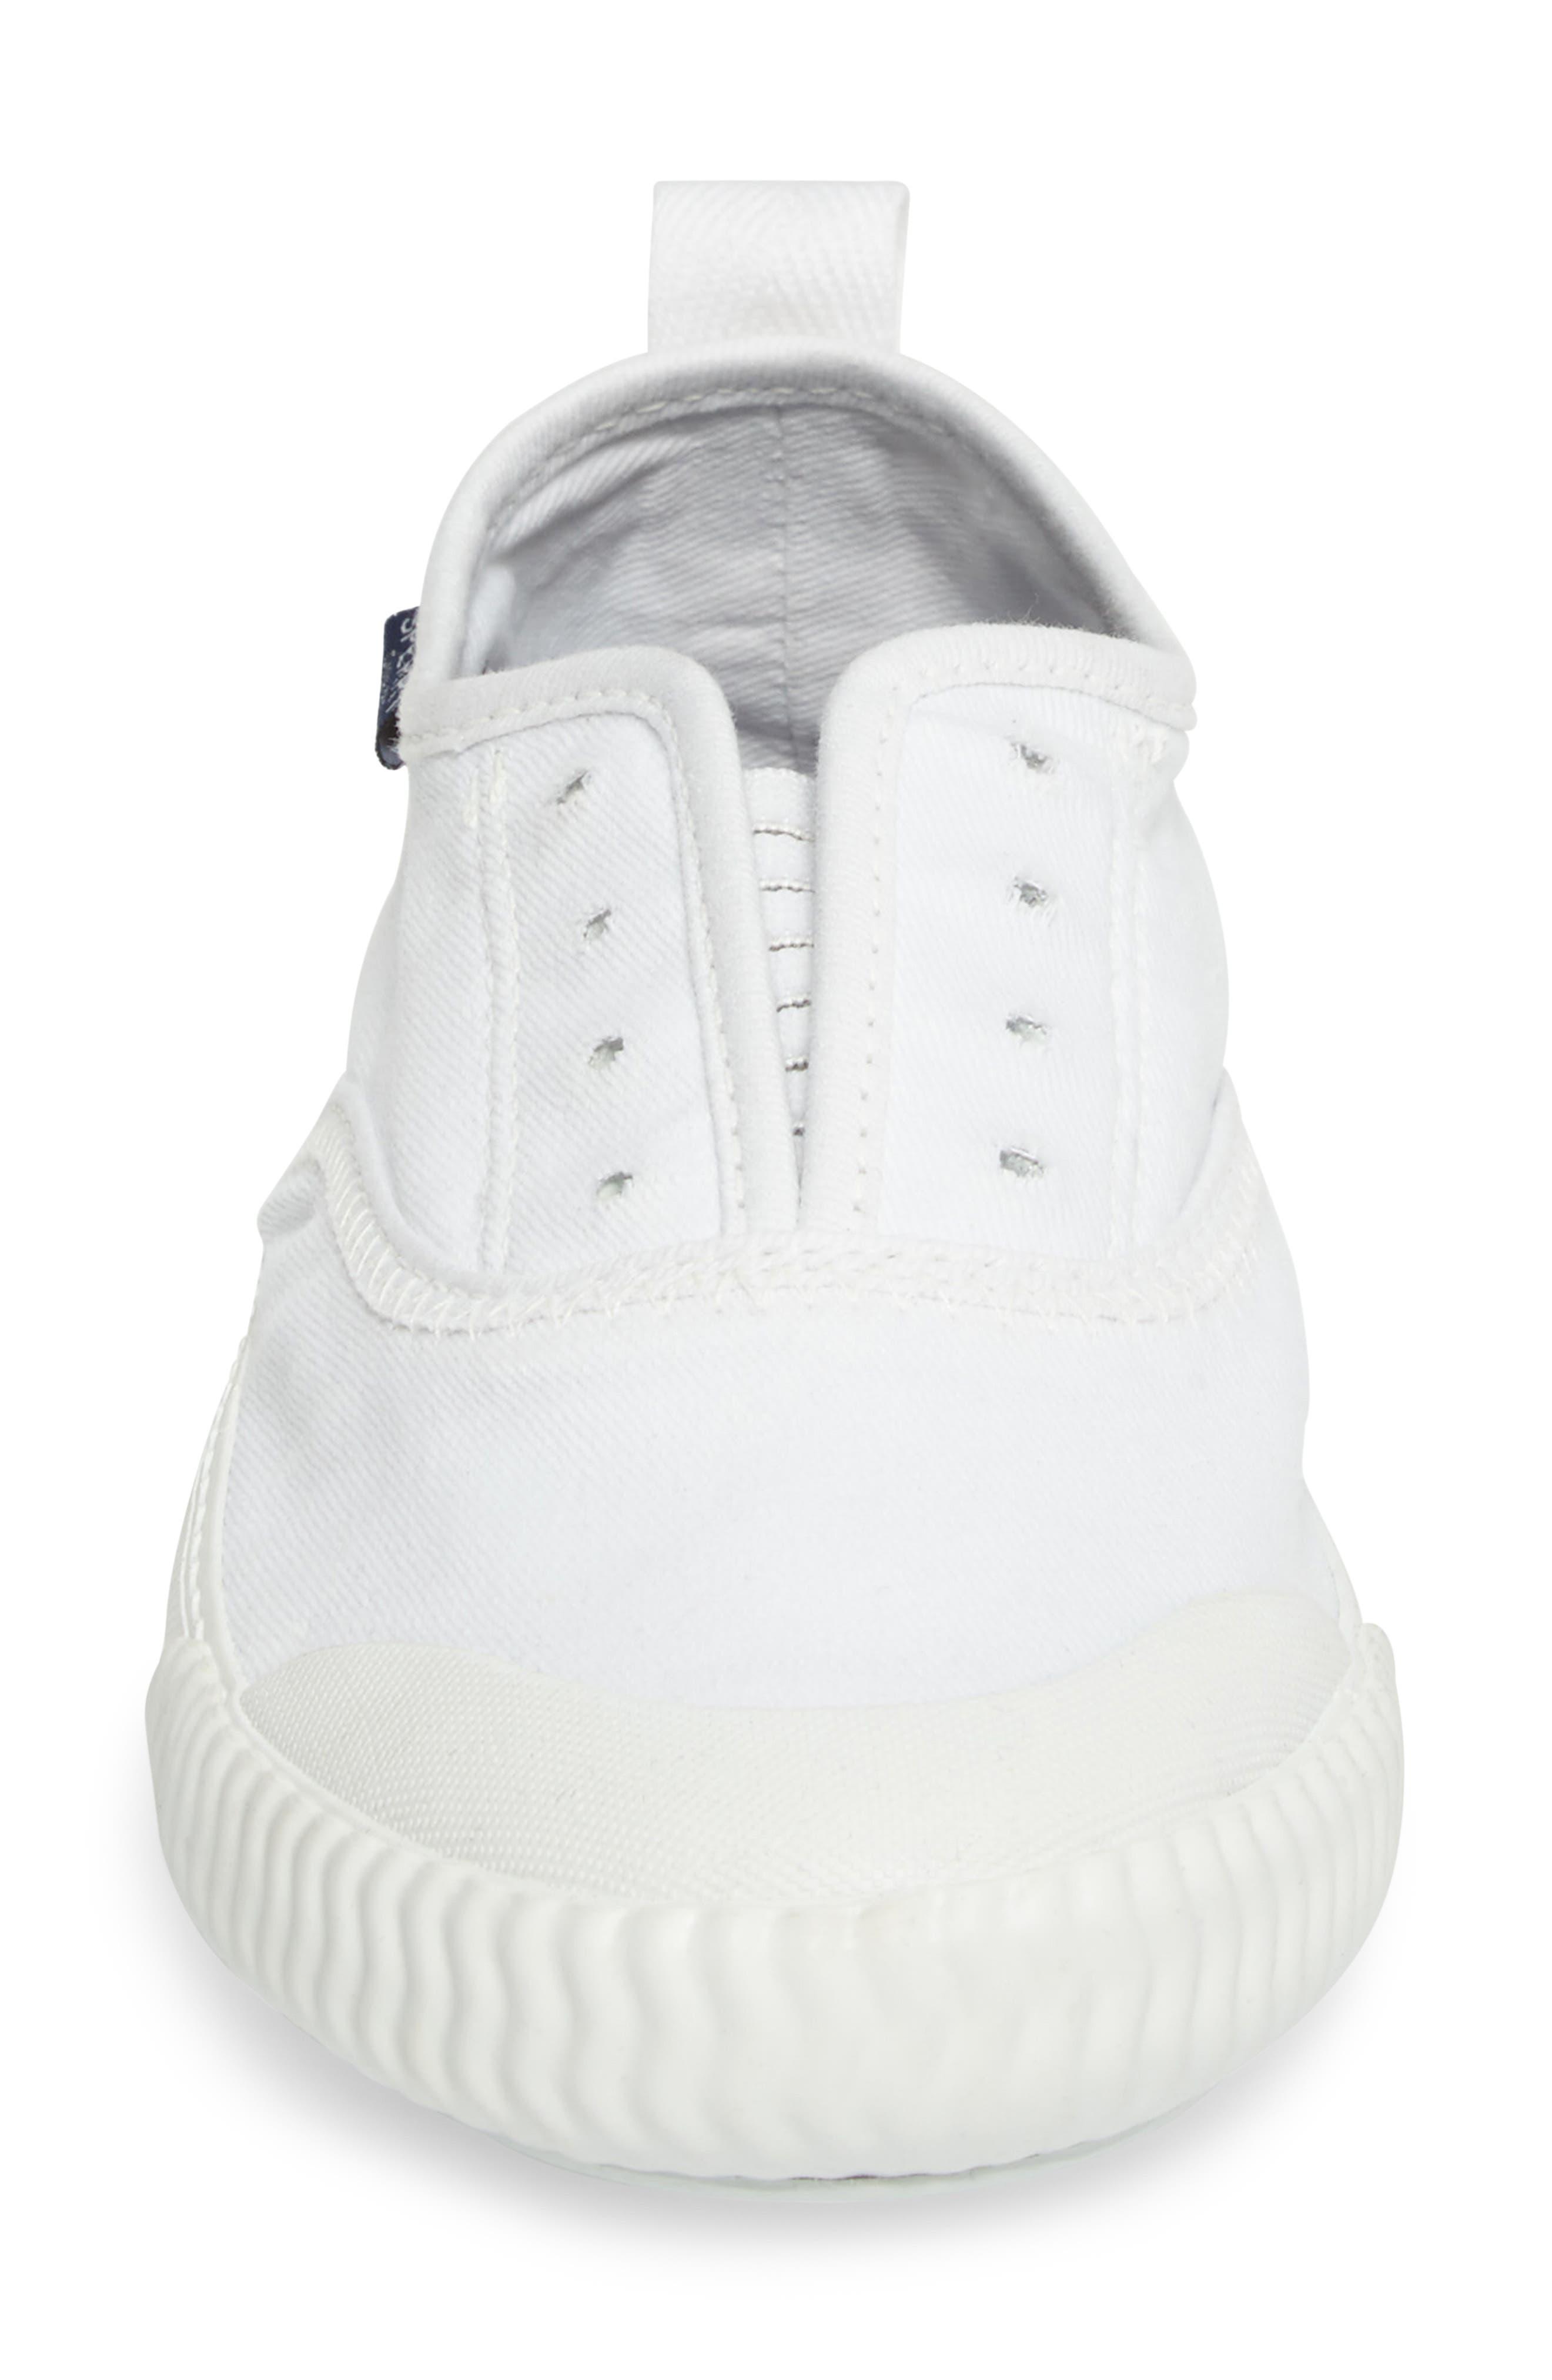 Sayel Slip-On Sneaker,                             Alternate thumbnail 4, color,                             White Fabric